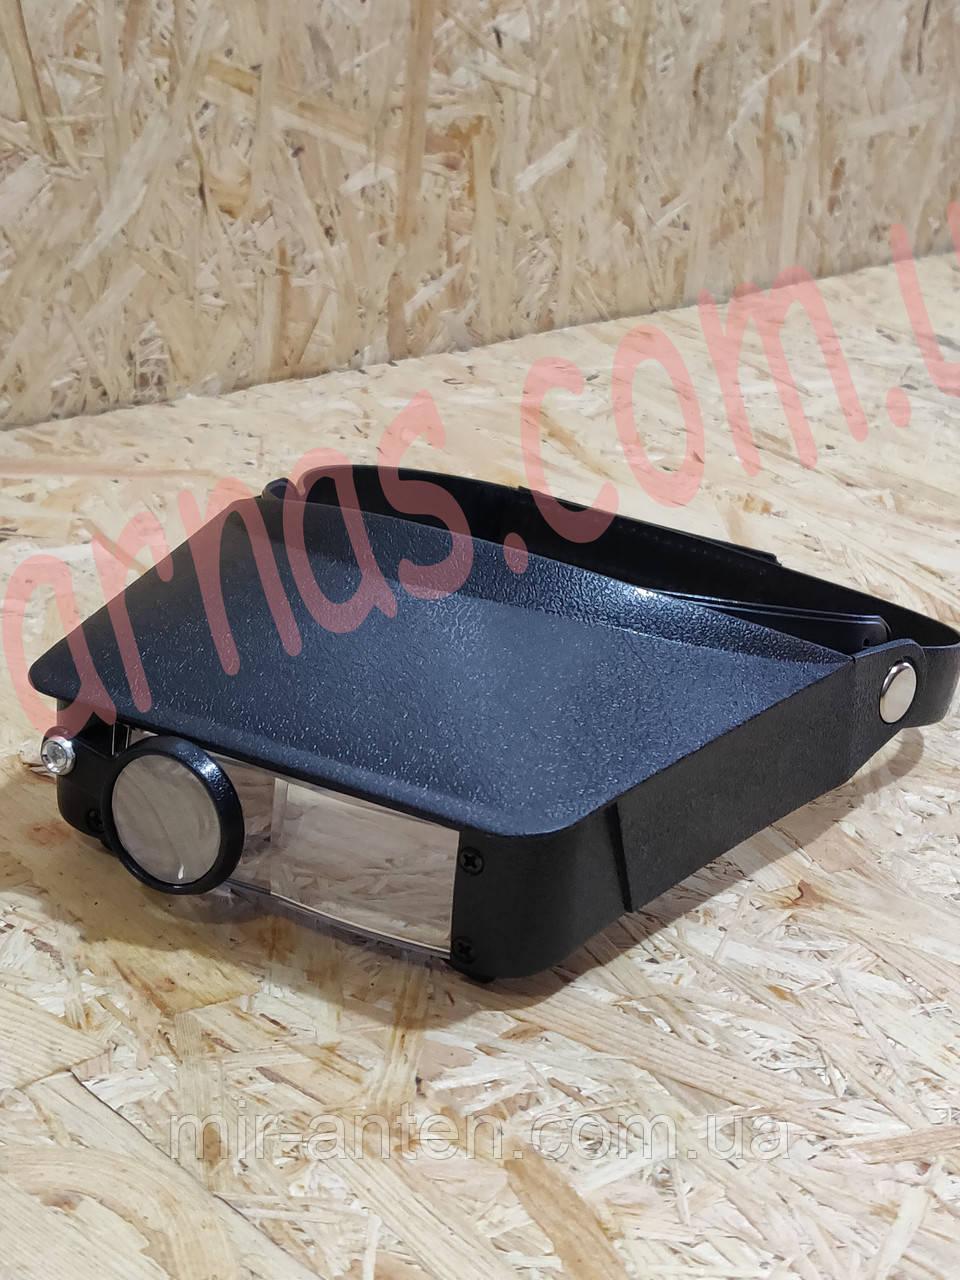 Бинокуляр очки бинокулярные MG81006